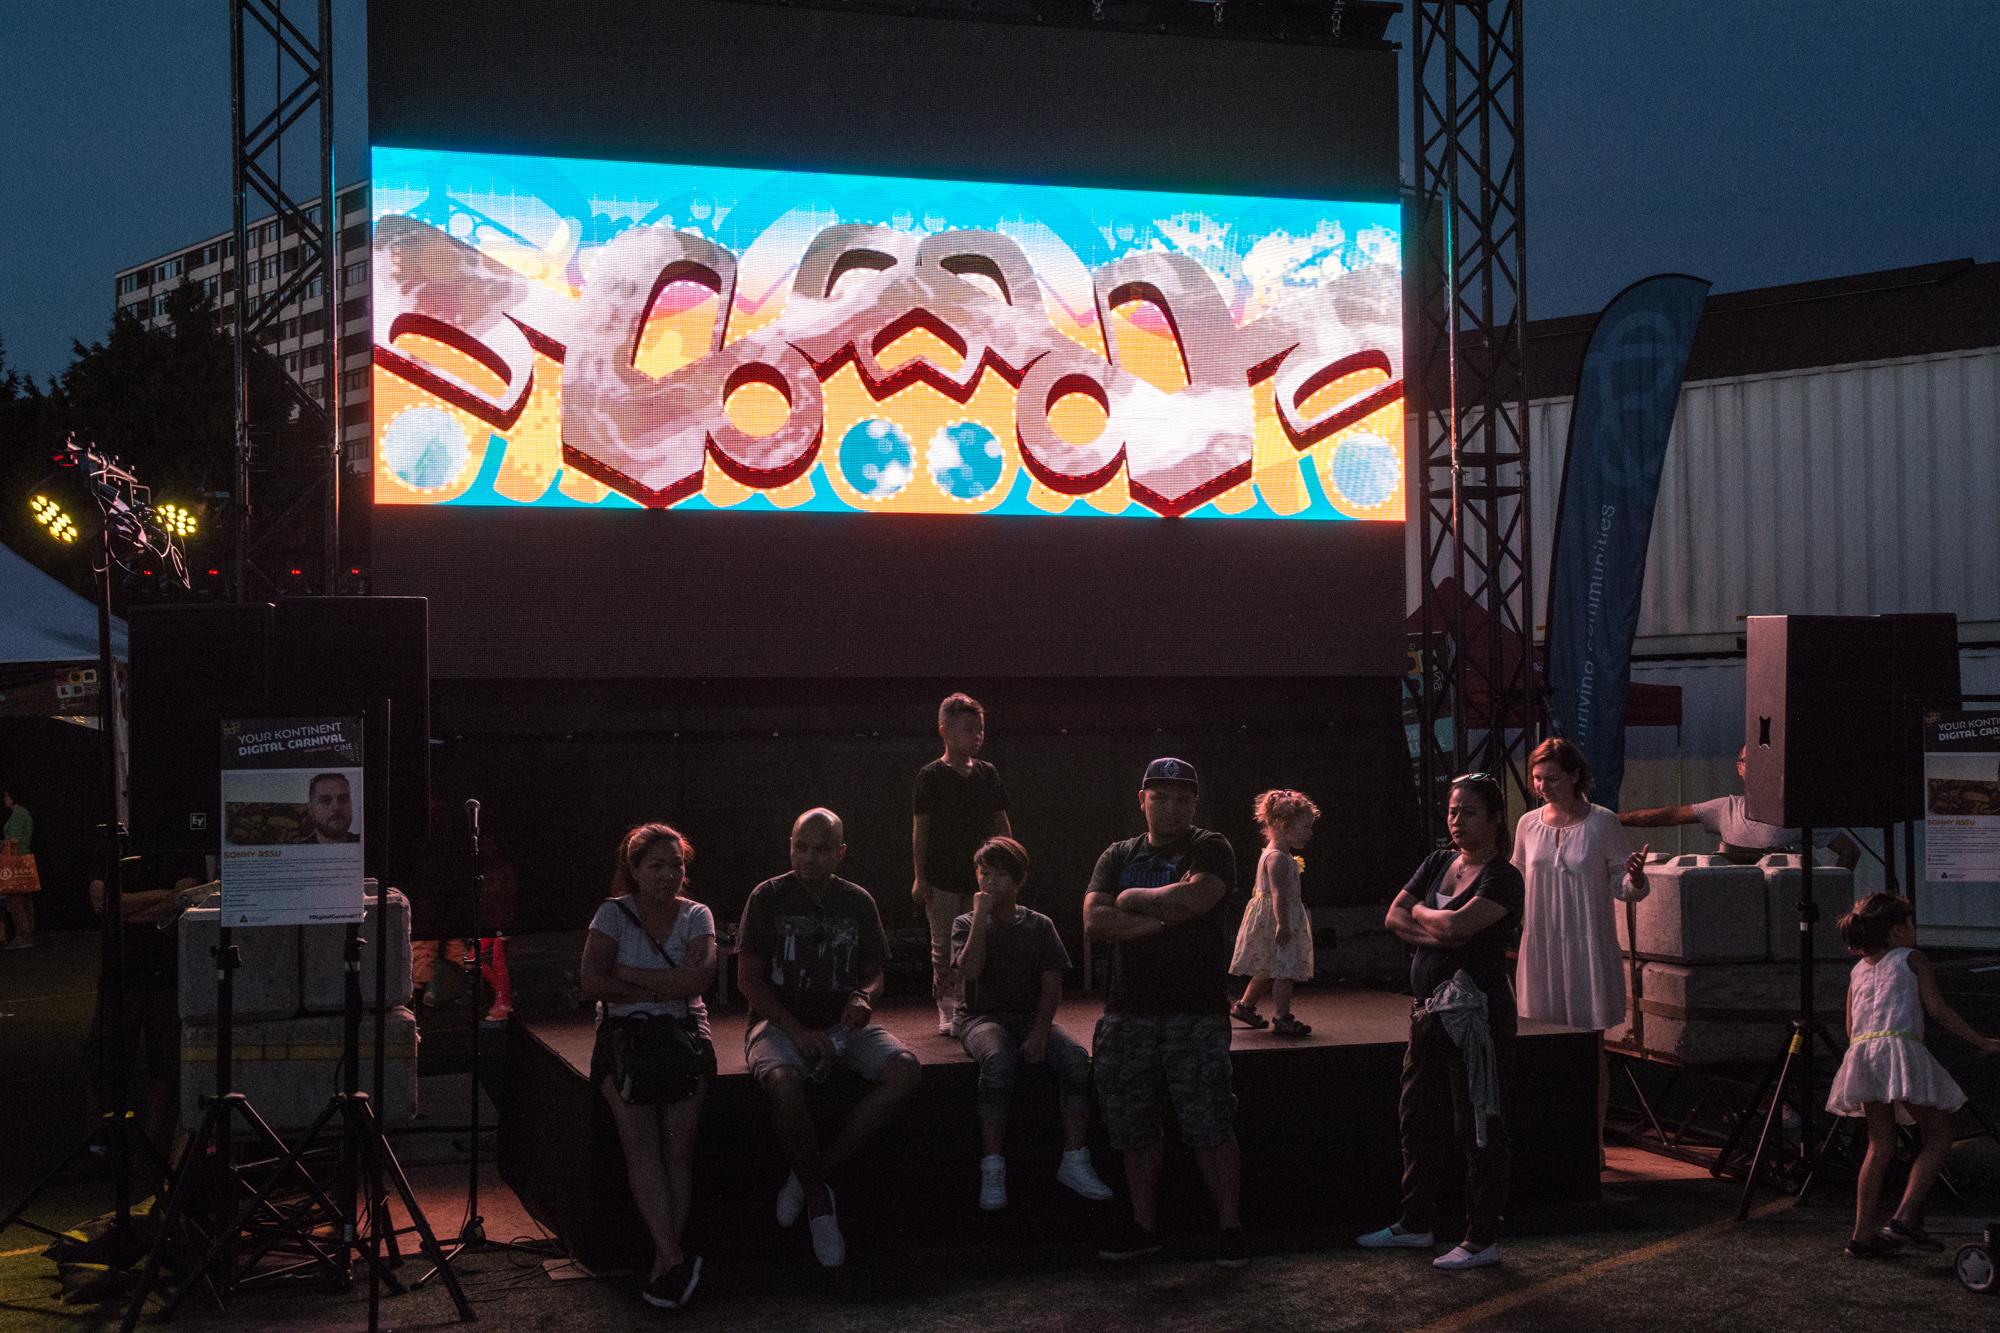 Sonny Assu, 1UP, video installation. Ash Tanasiychuk photo.